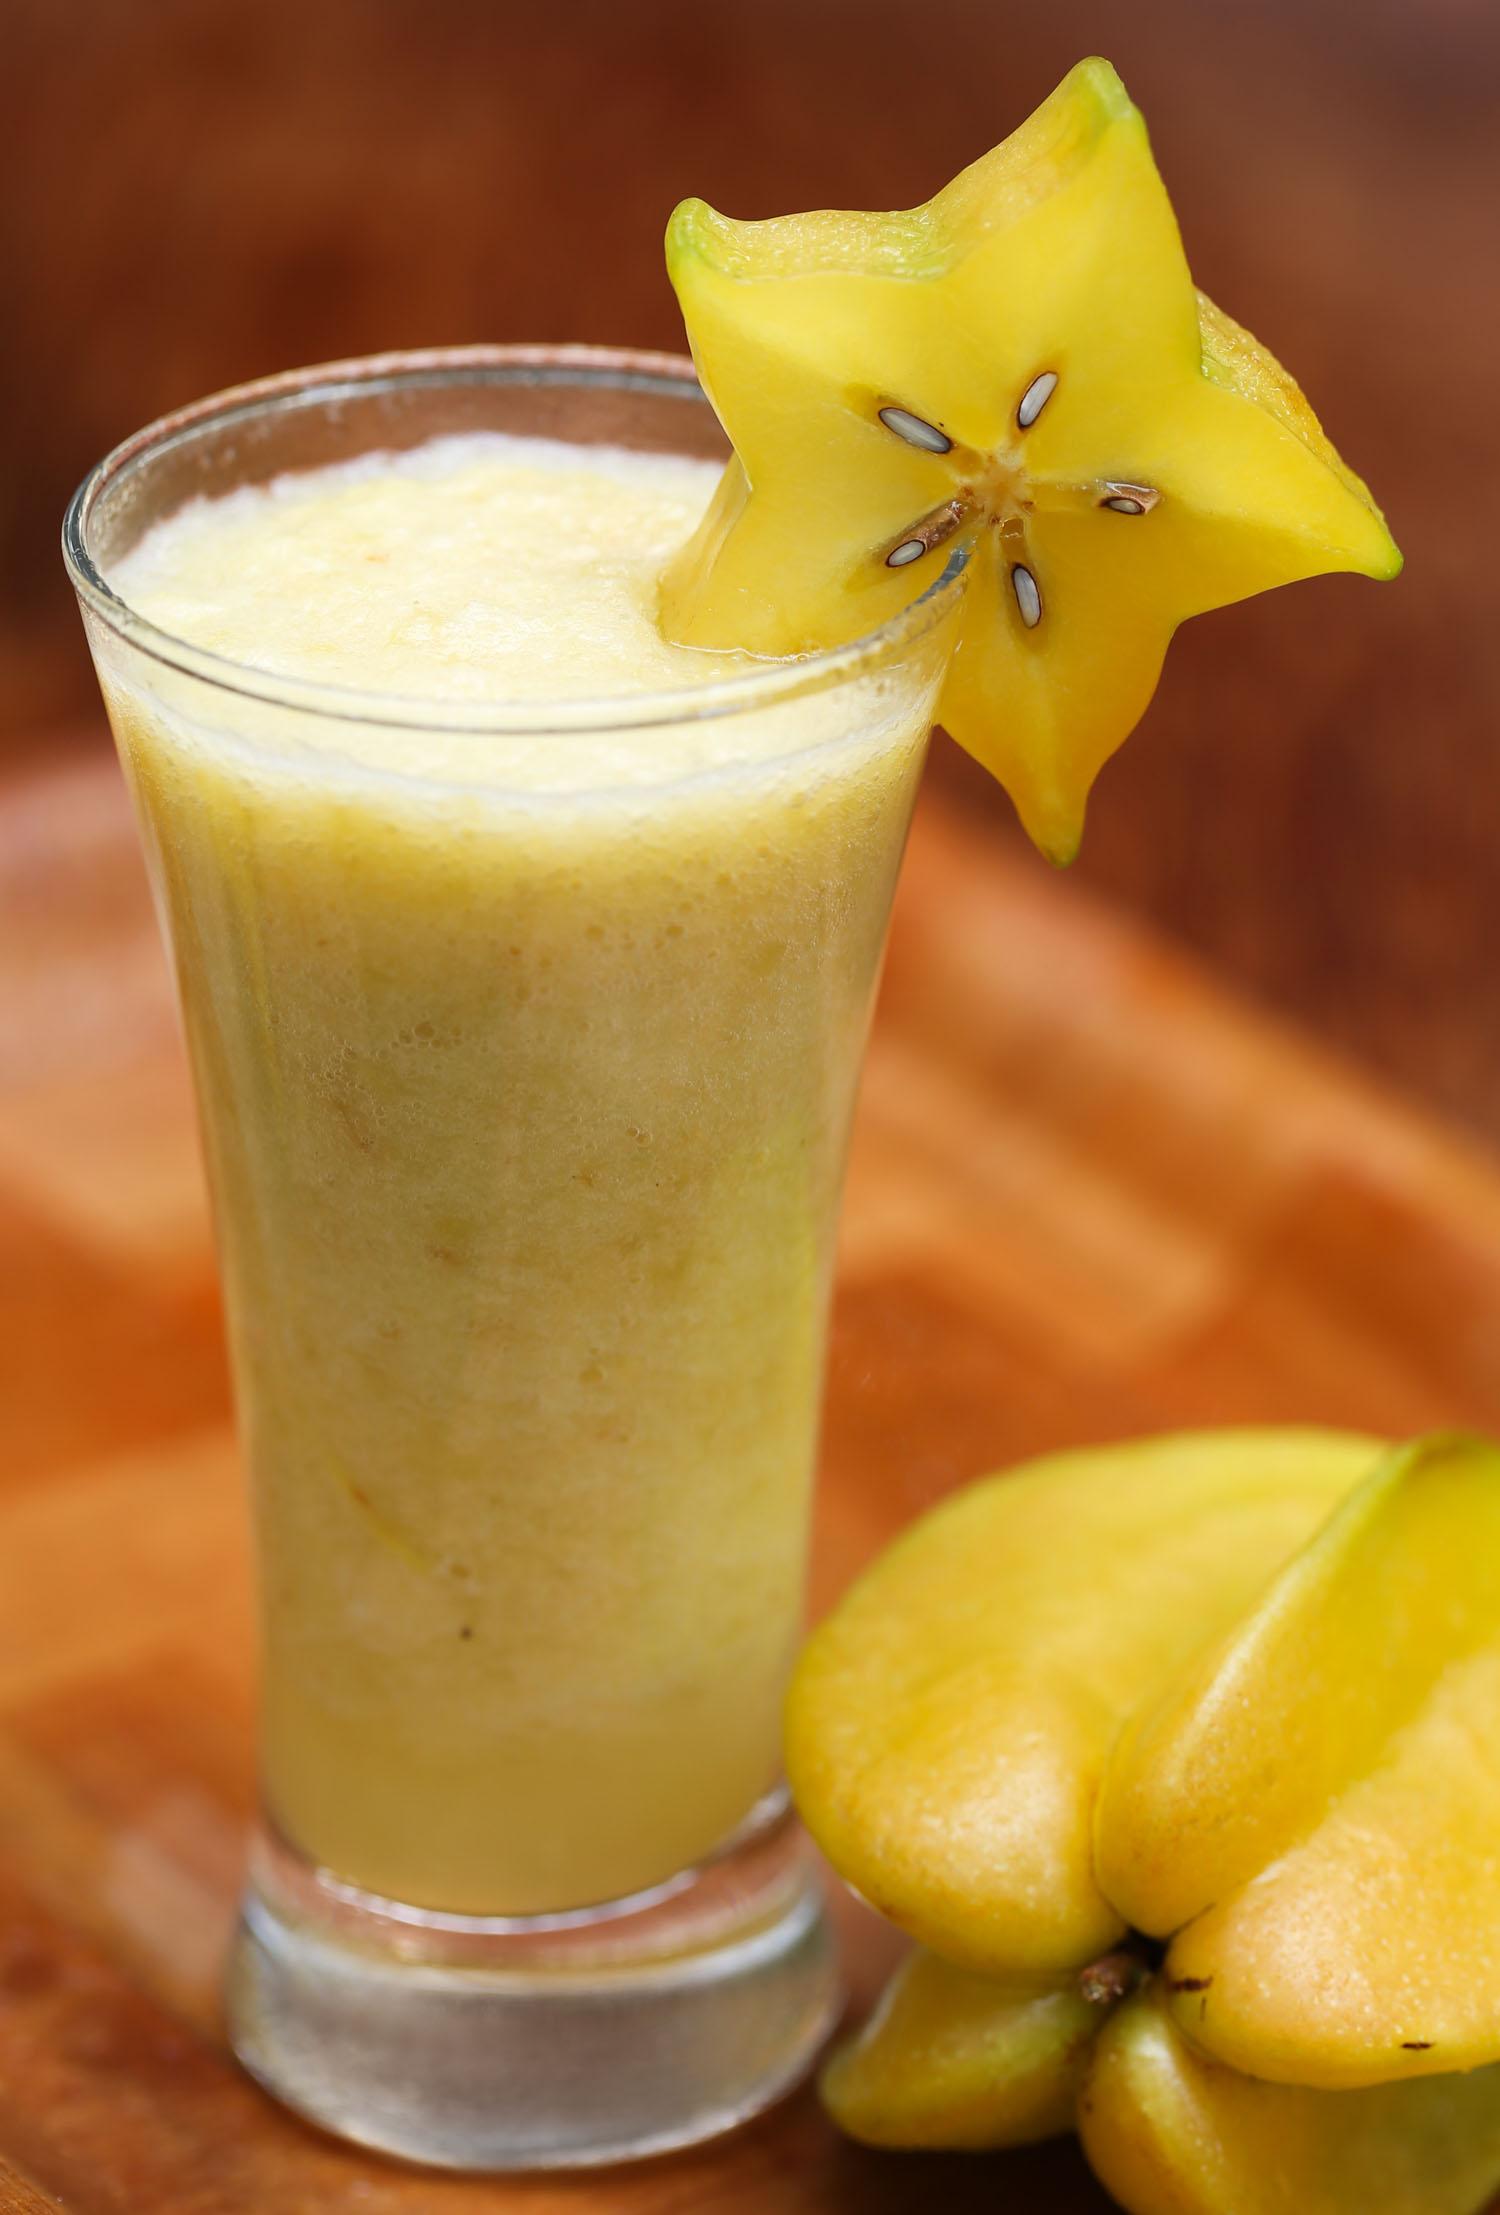 Carambolaor starfruit juice in a glass with ripe fruit known as licuado juice in Honduras